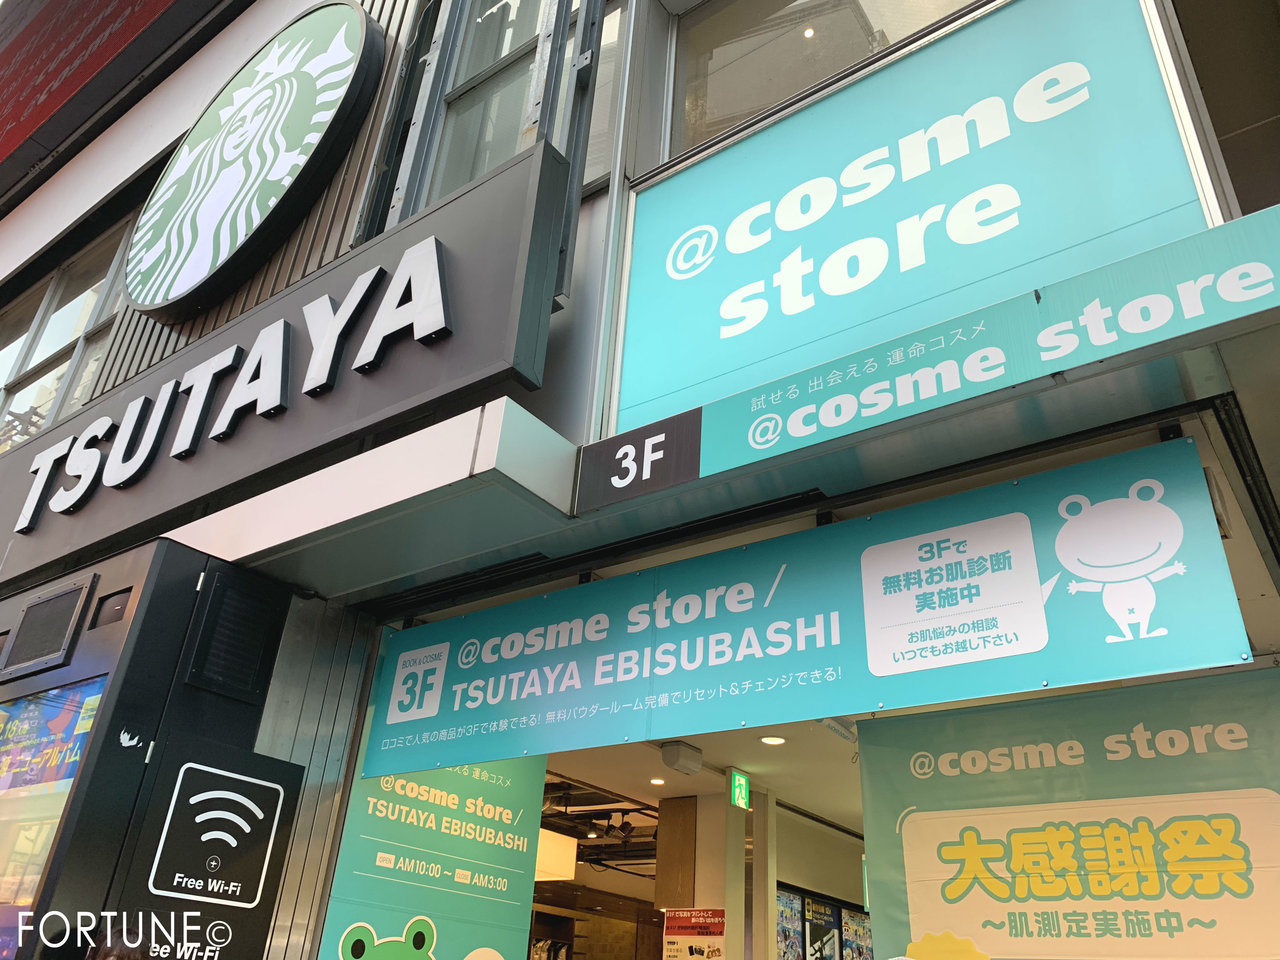 @cosme store / TSUTAYA EBISUBASHI店